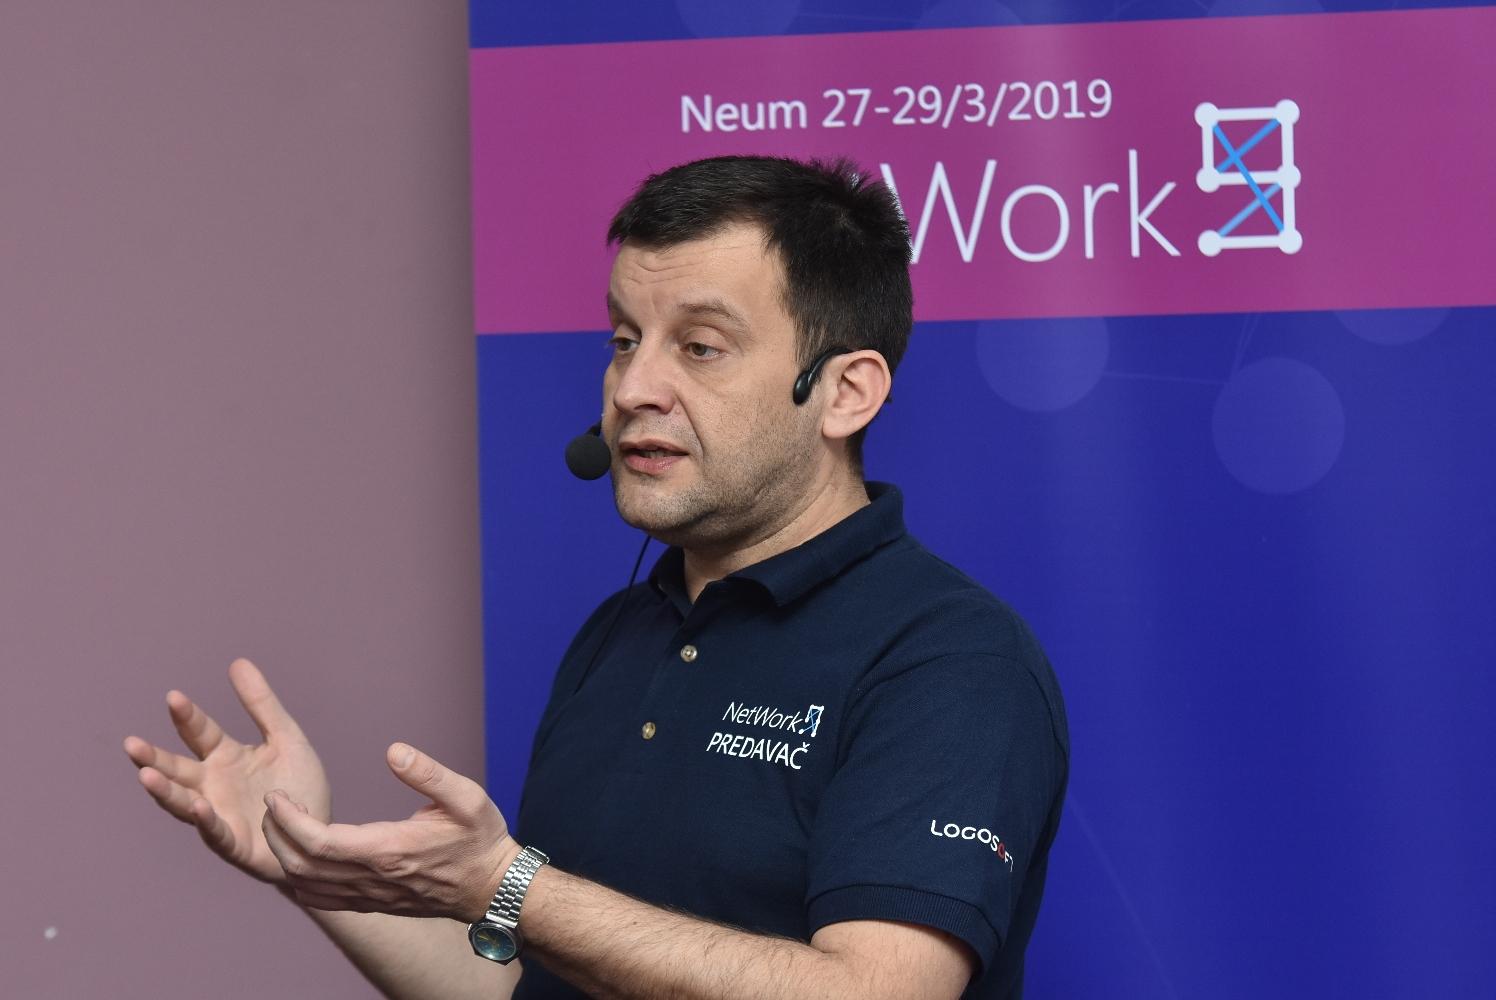 5a - NetWork 9 - Dragan Panjkov